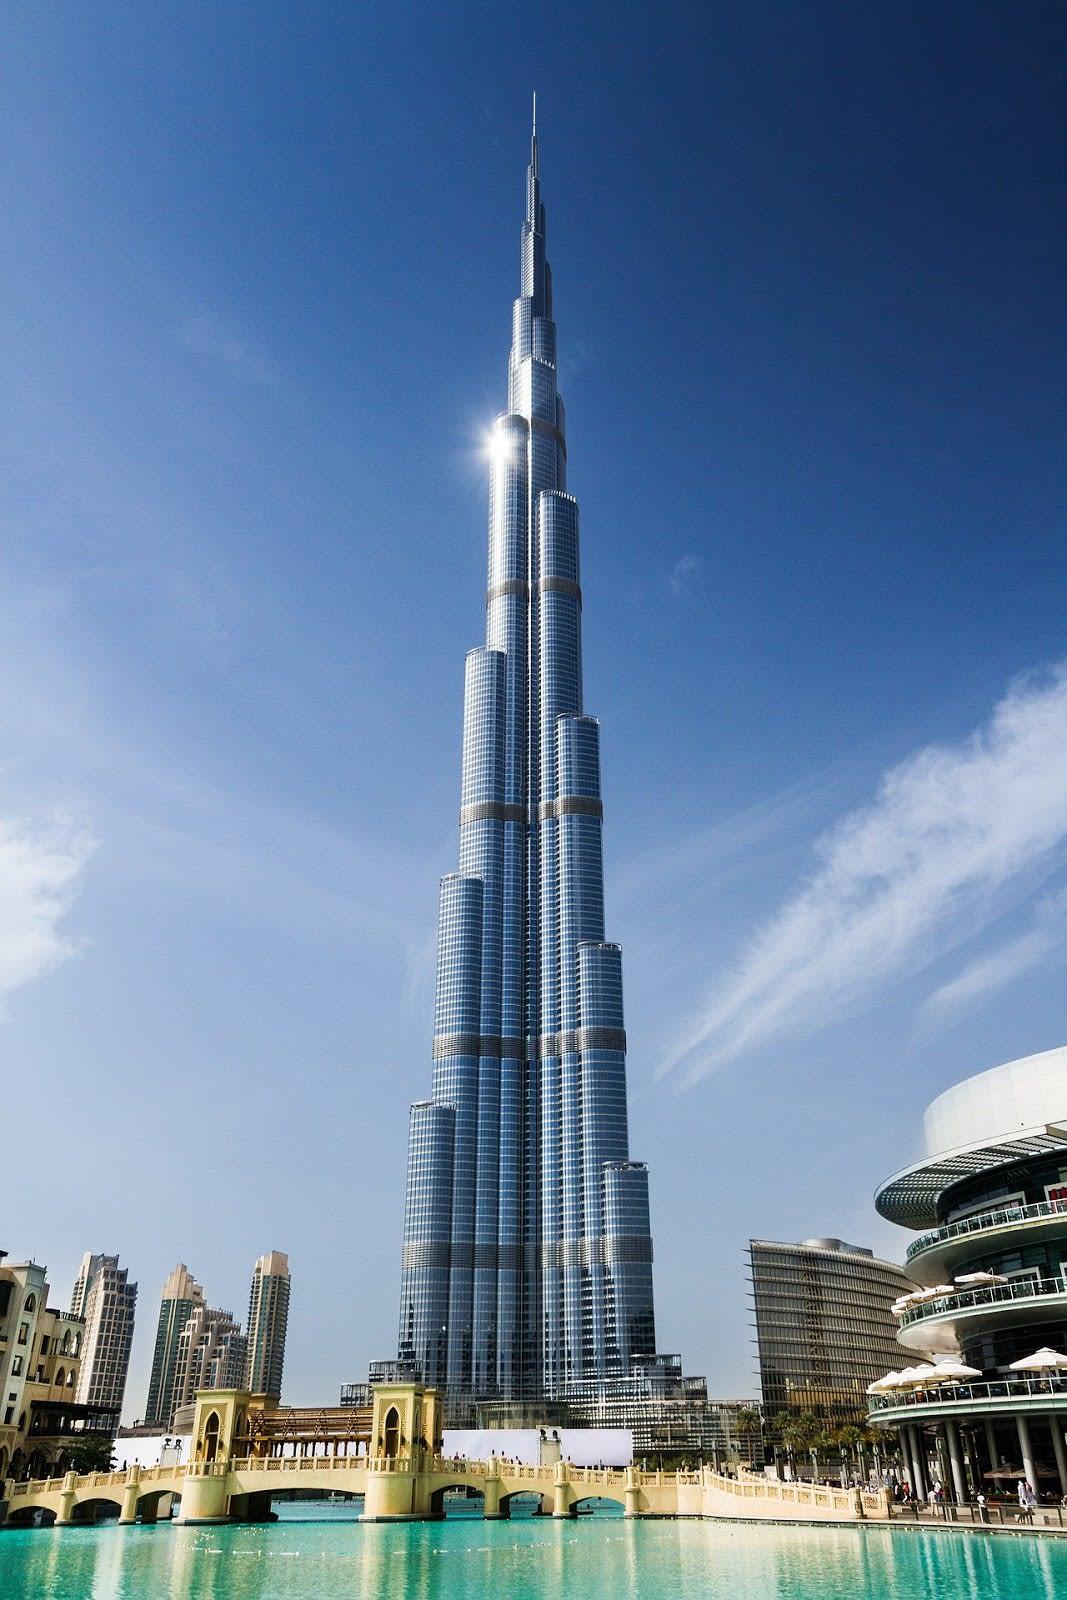 The tallest building Dubai